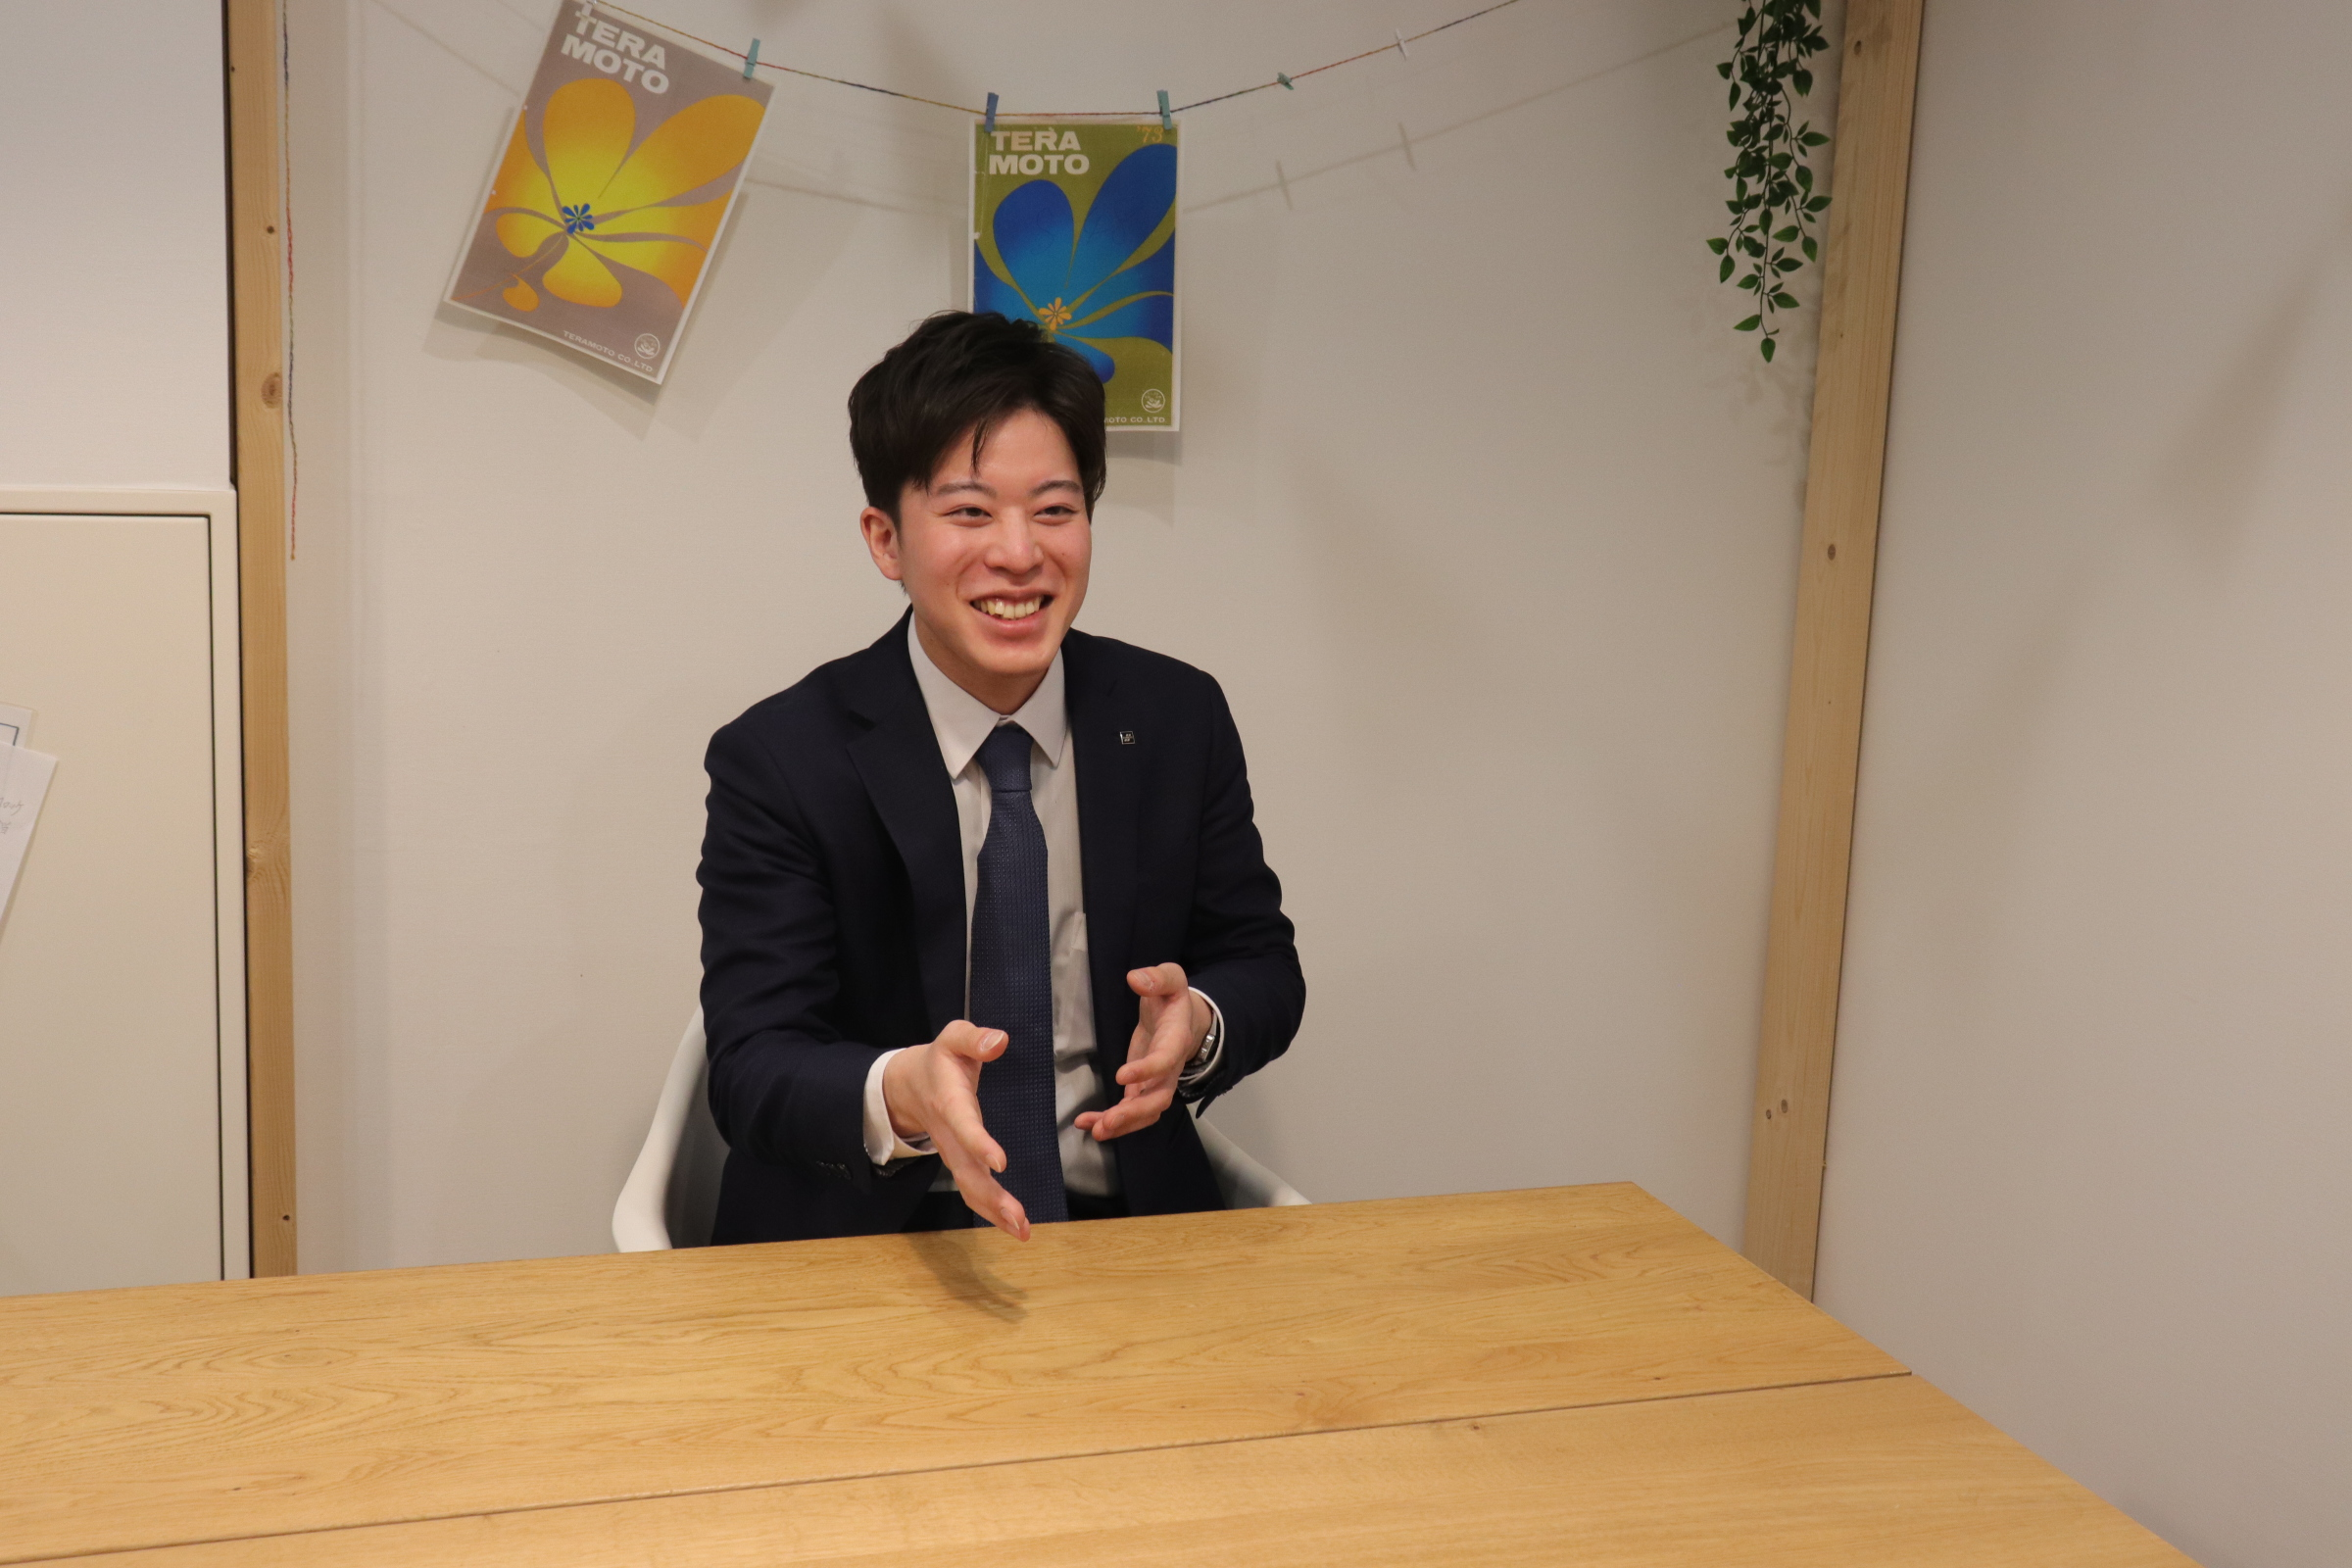 菅野 智洋